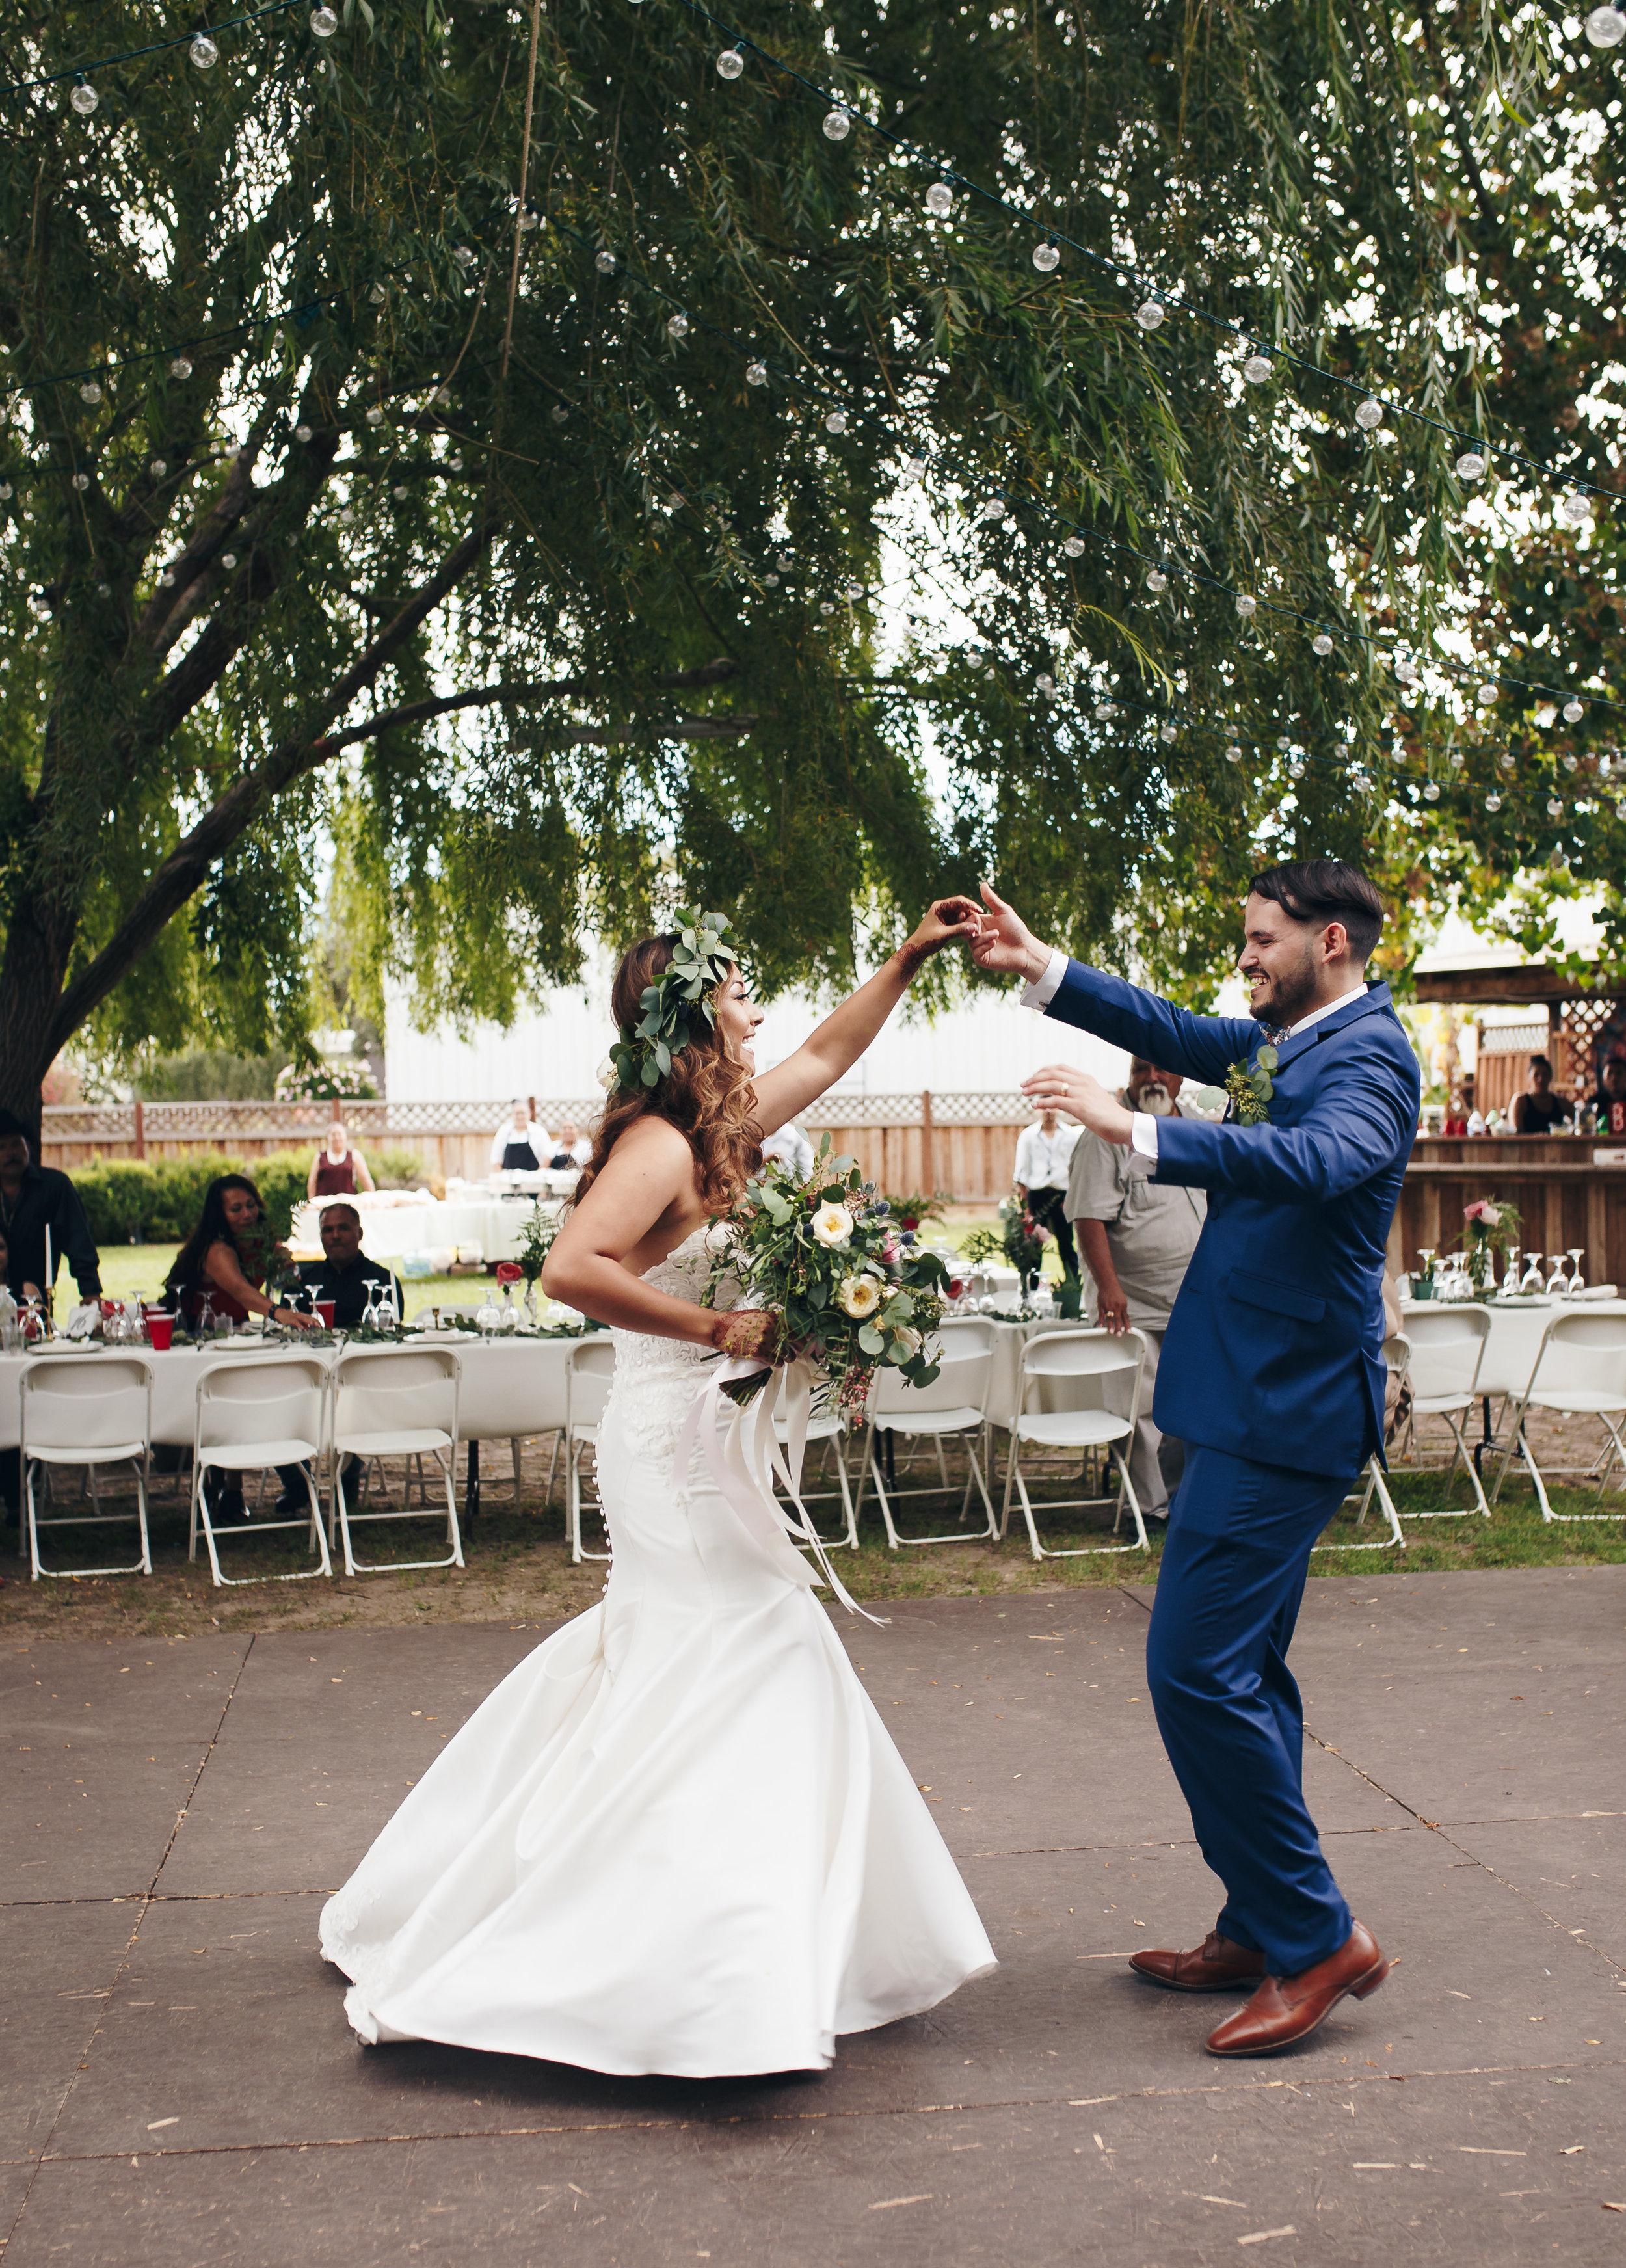 Veronica & Adrian Wedding 50 (1 of 1).jpg